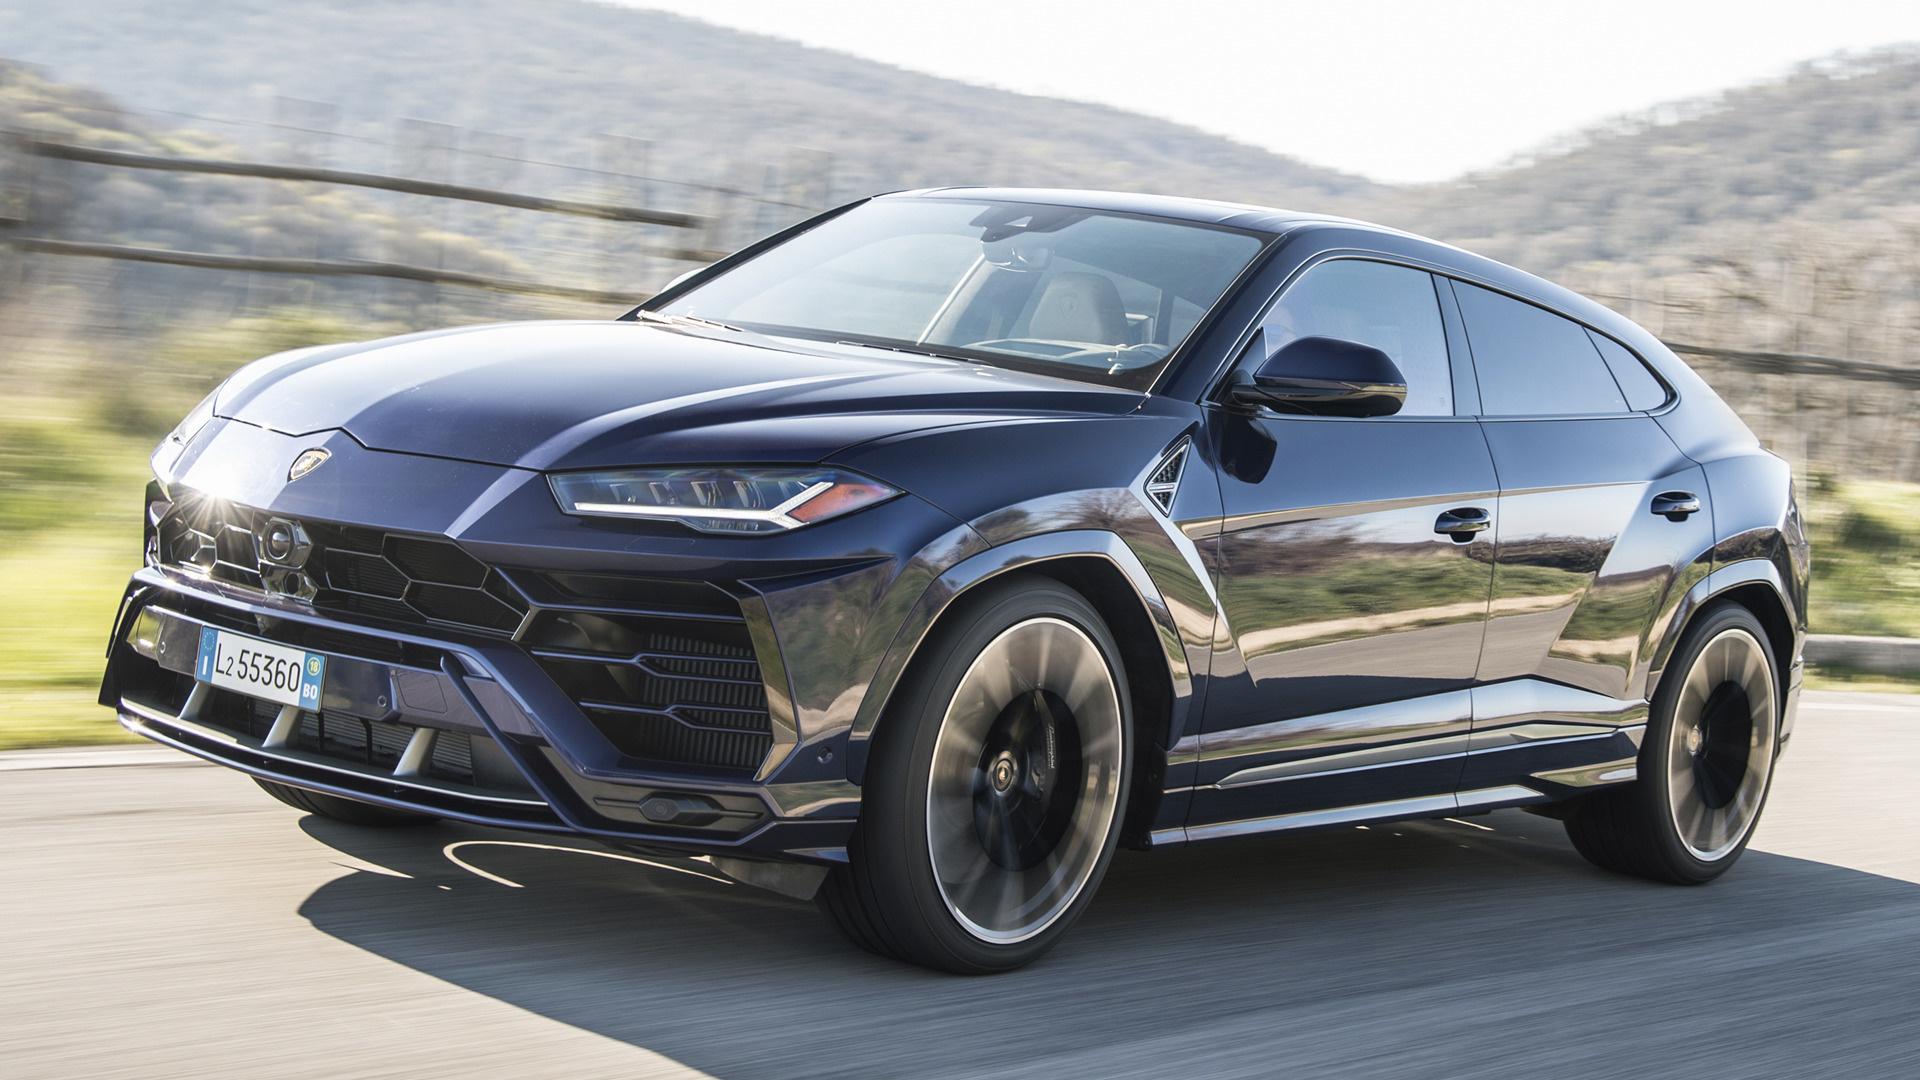 2019 Lamborghini Urus Us Wallpapers And Hd Images